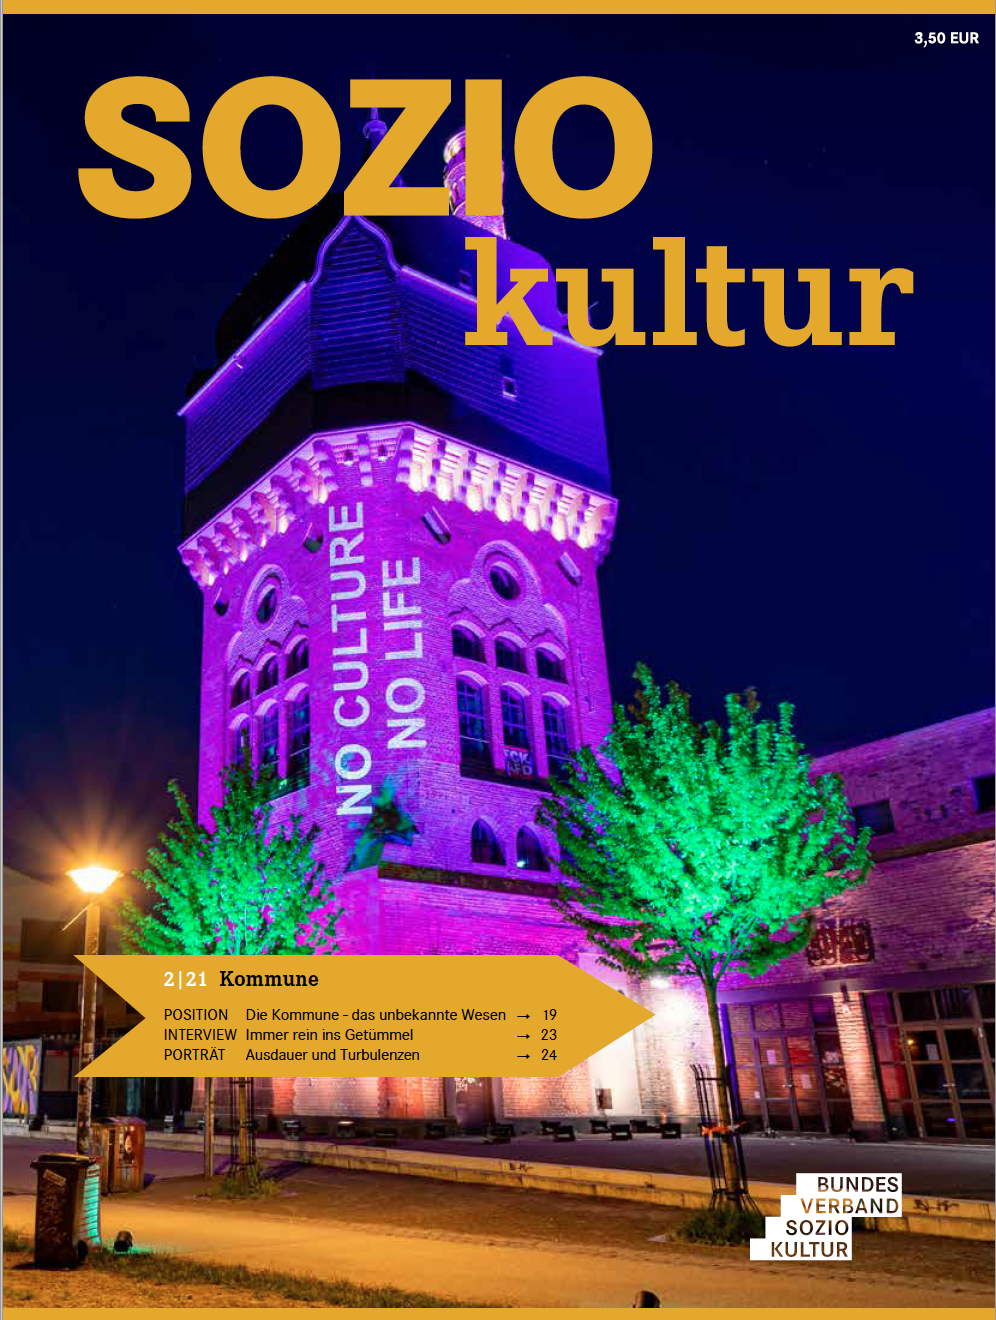 SOZIOkultur_Thema Kommune_Page_01.png (1.53 MB)